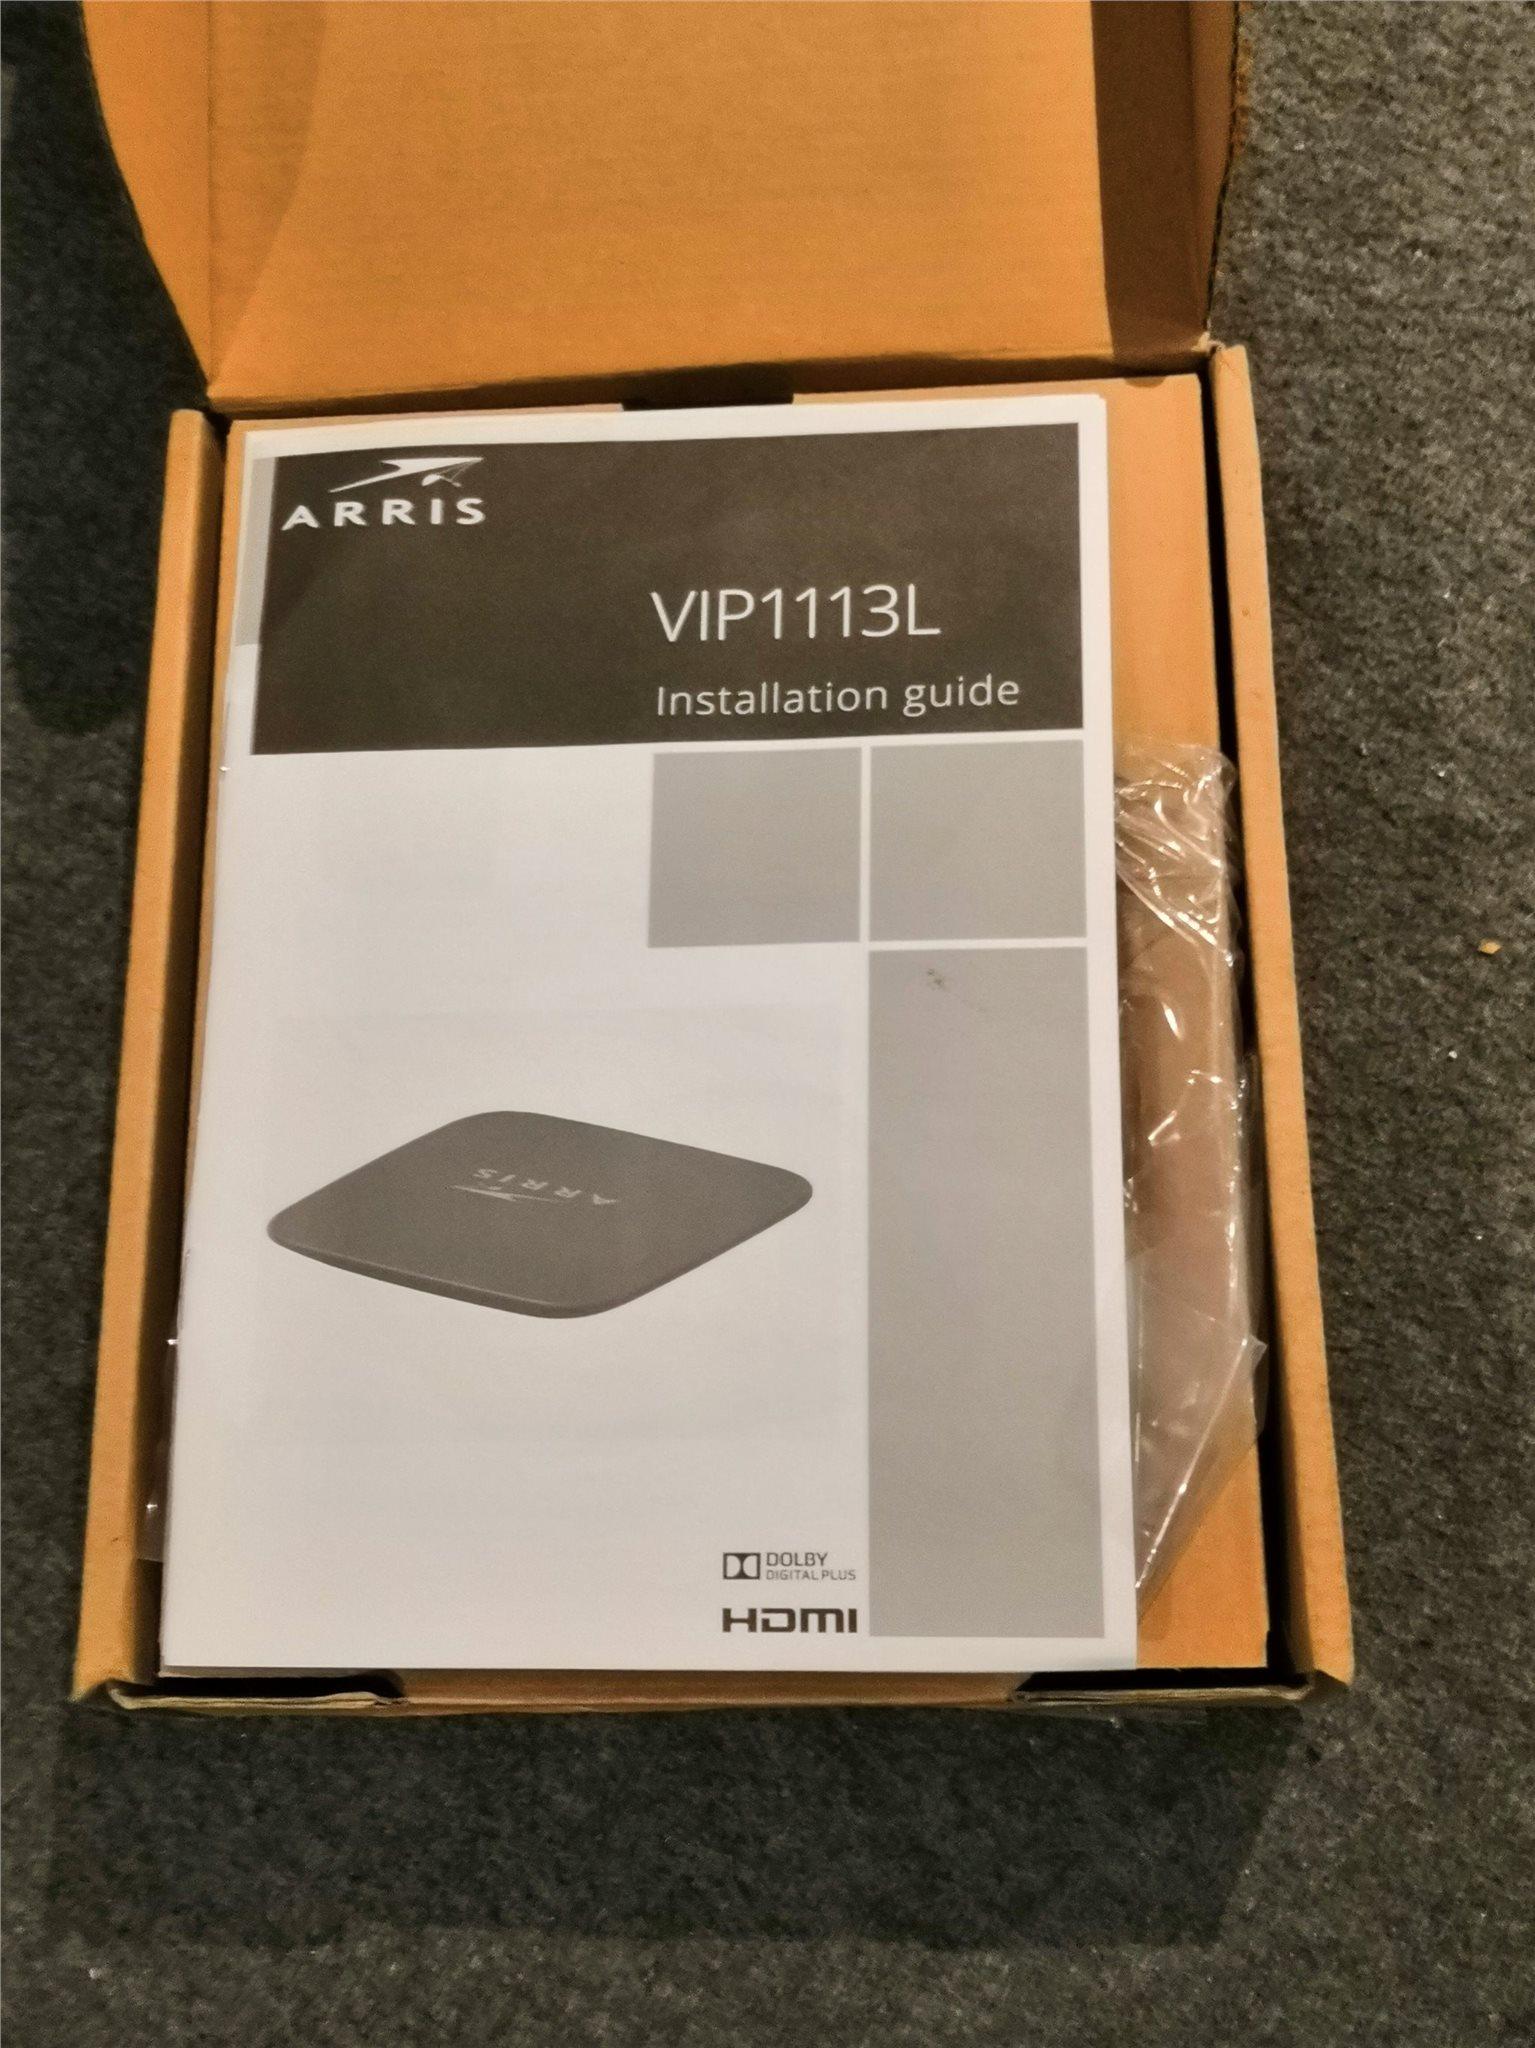 arris vip1113l installation guide